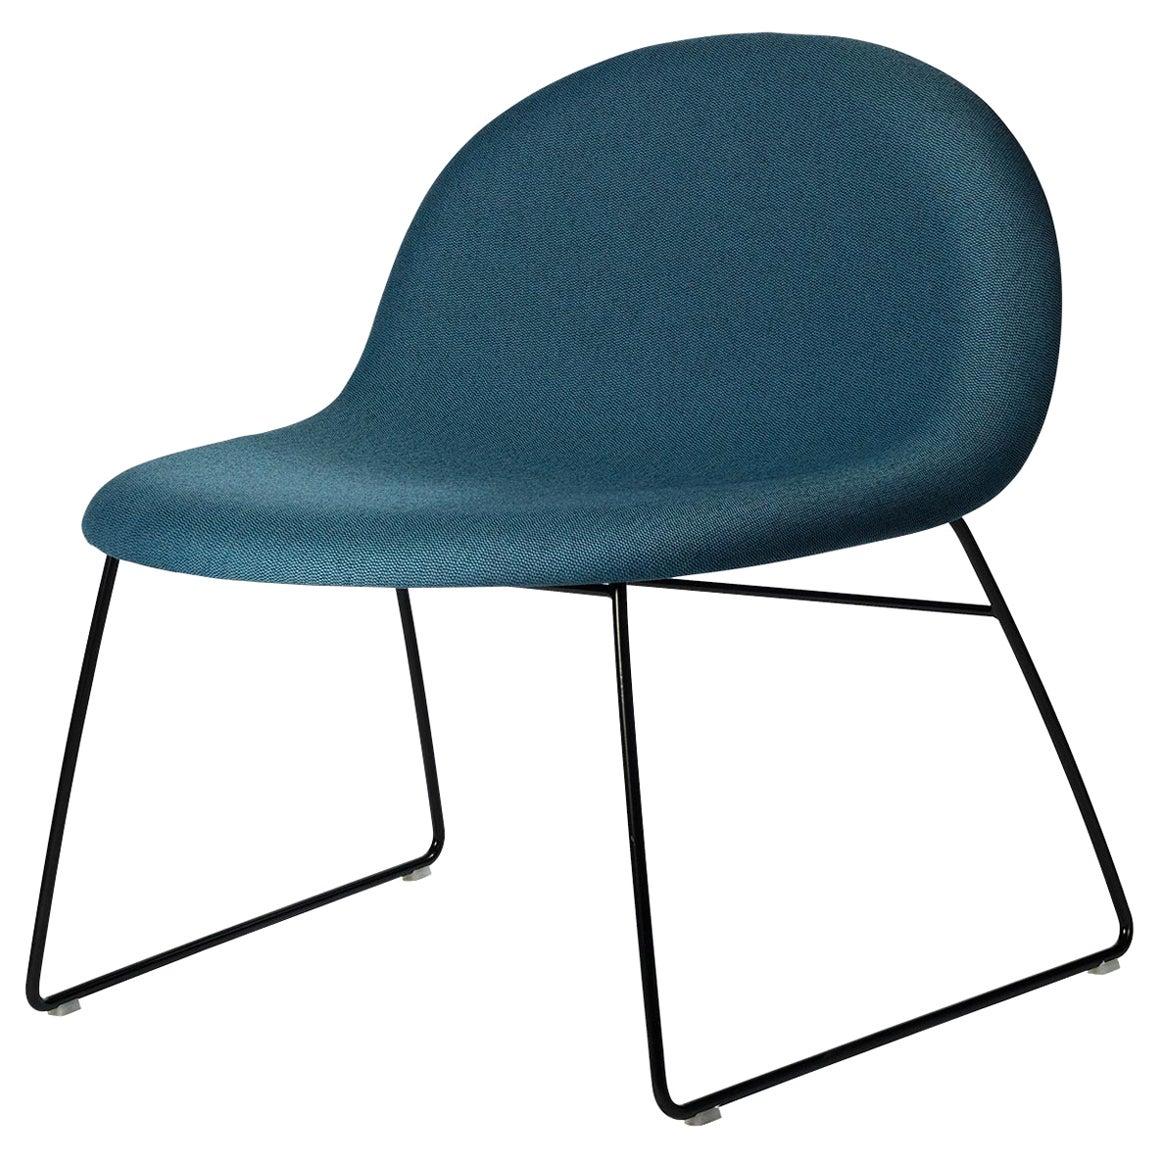 3D Lounge Chair, Un-Upholstered, Sledge Base, Black Semi Matt